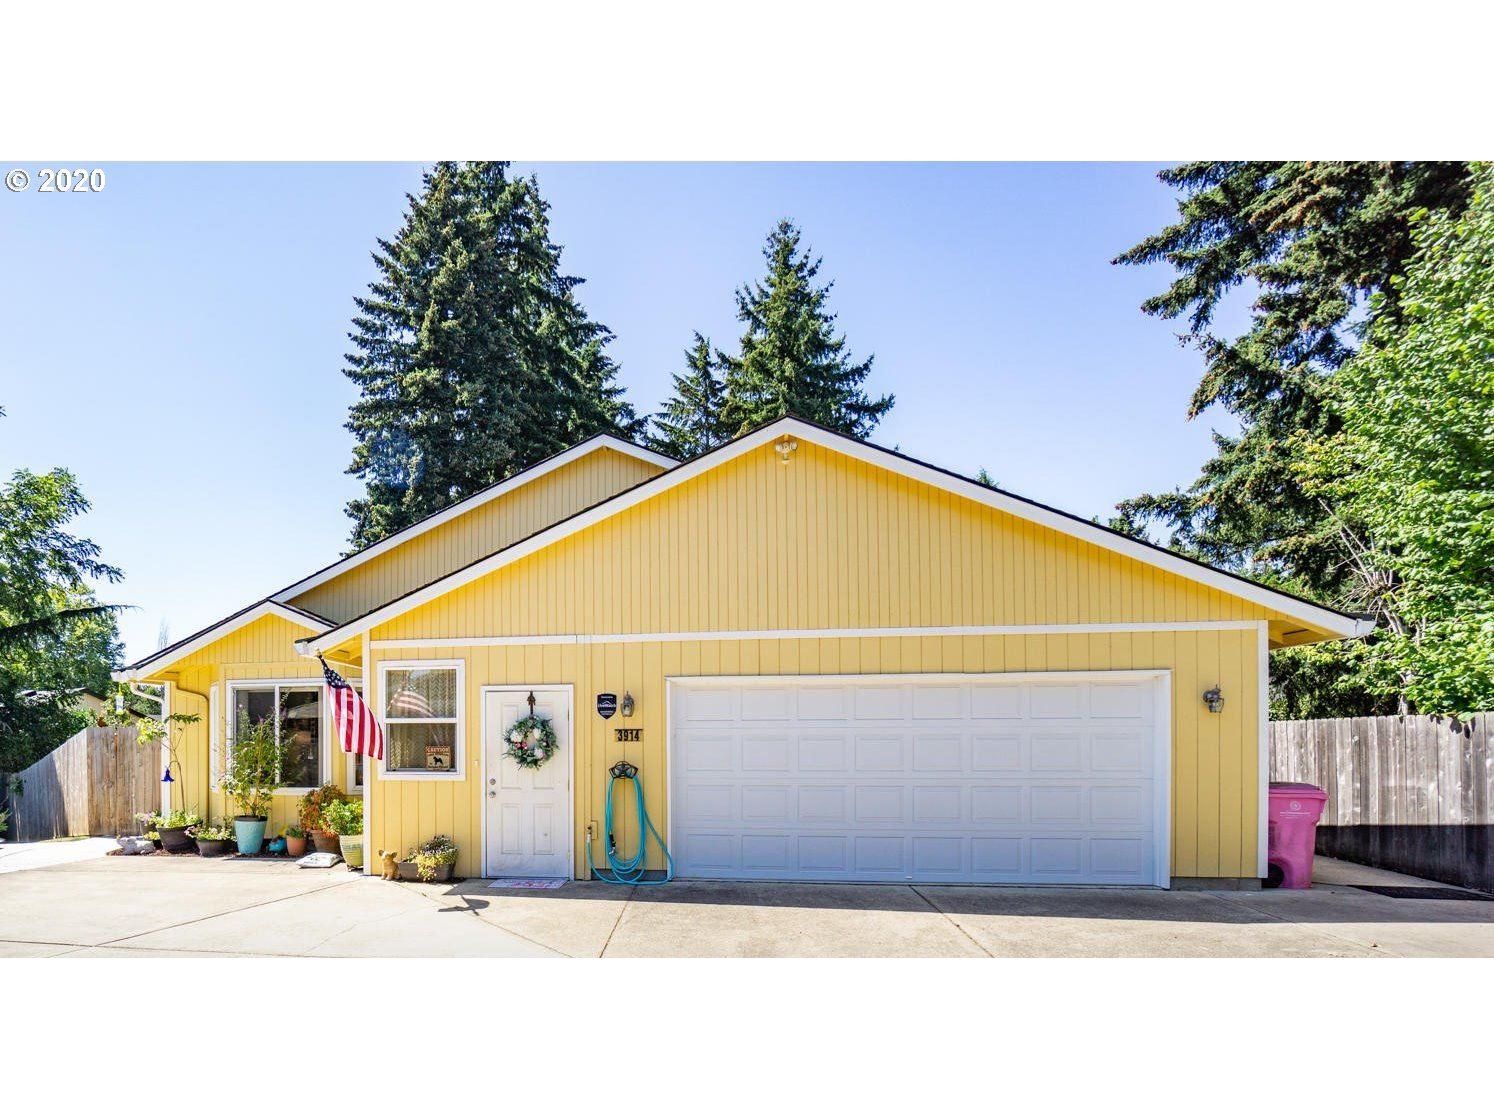 3914 NE 59TH CT, Vancouver, WA 98661 - MLS#: 20051609